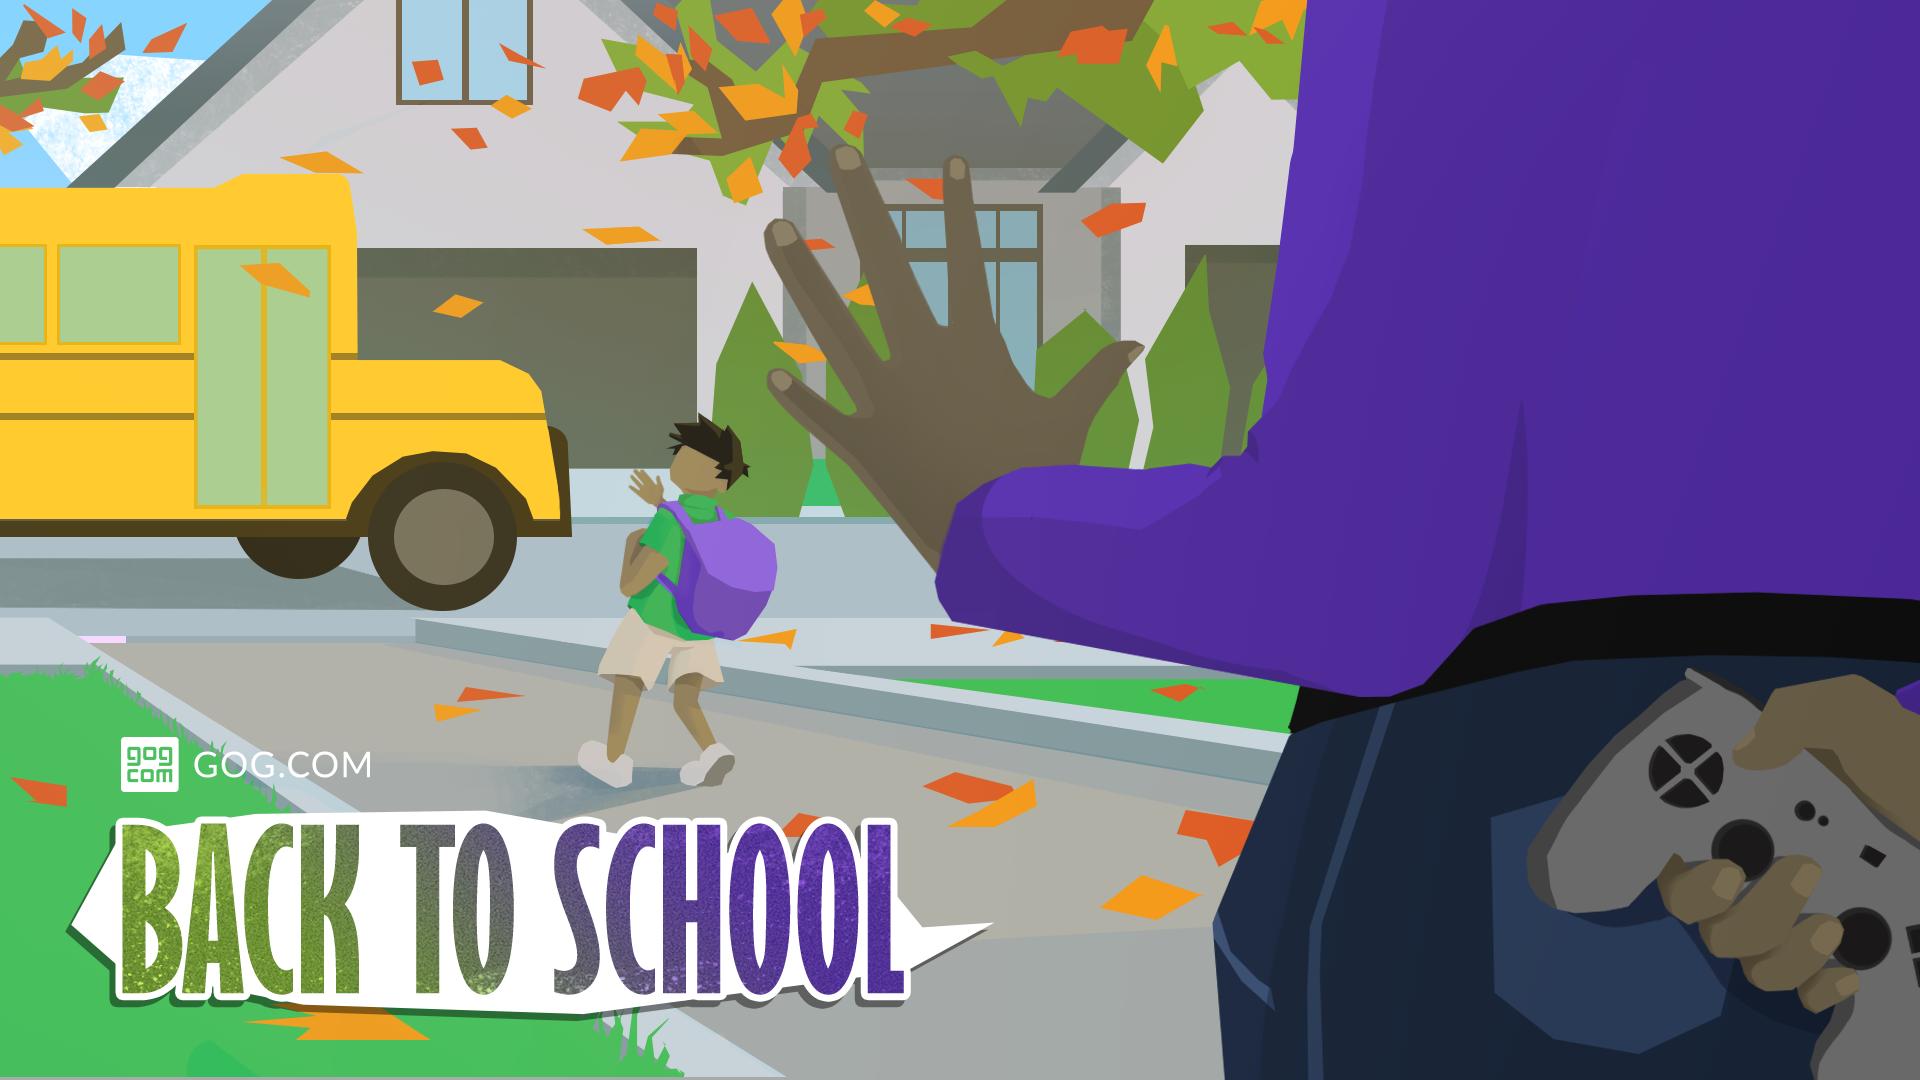 GOG back to school